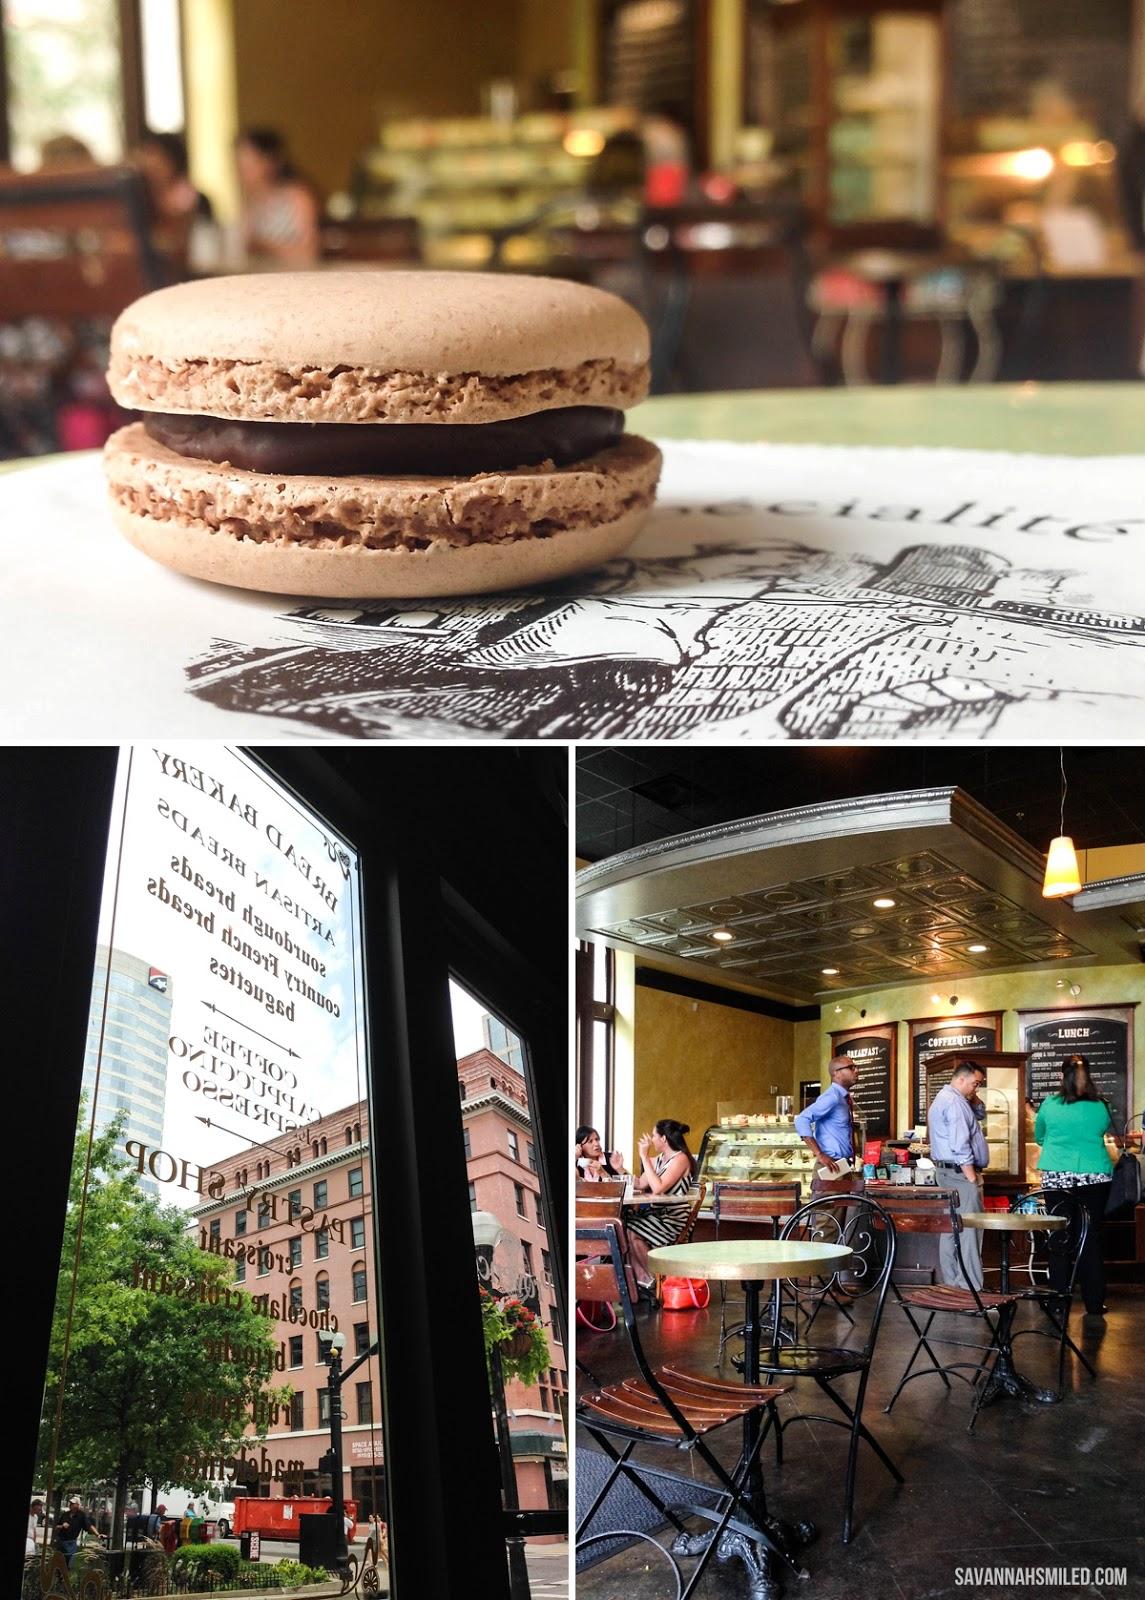 provence-breads-cafe-downtown-nashville-1.jpg